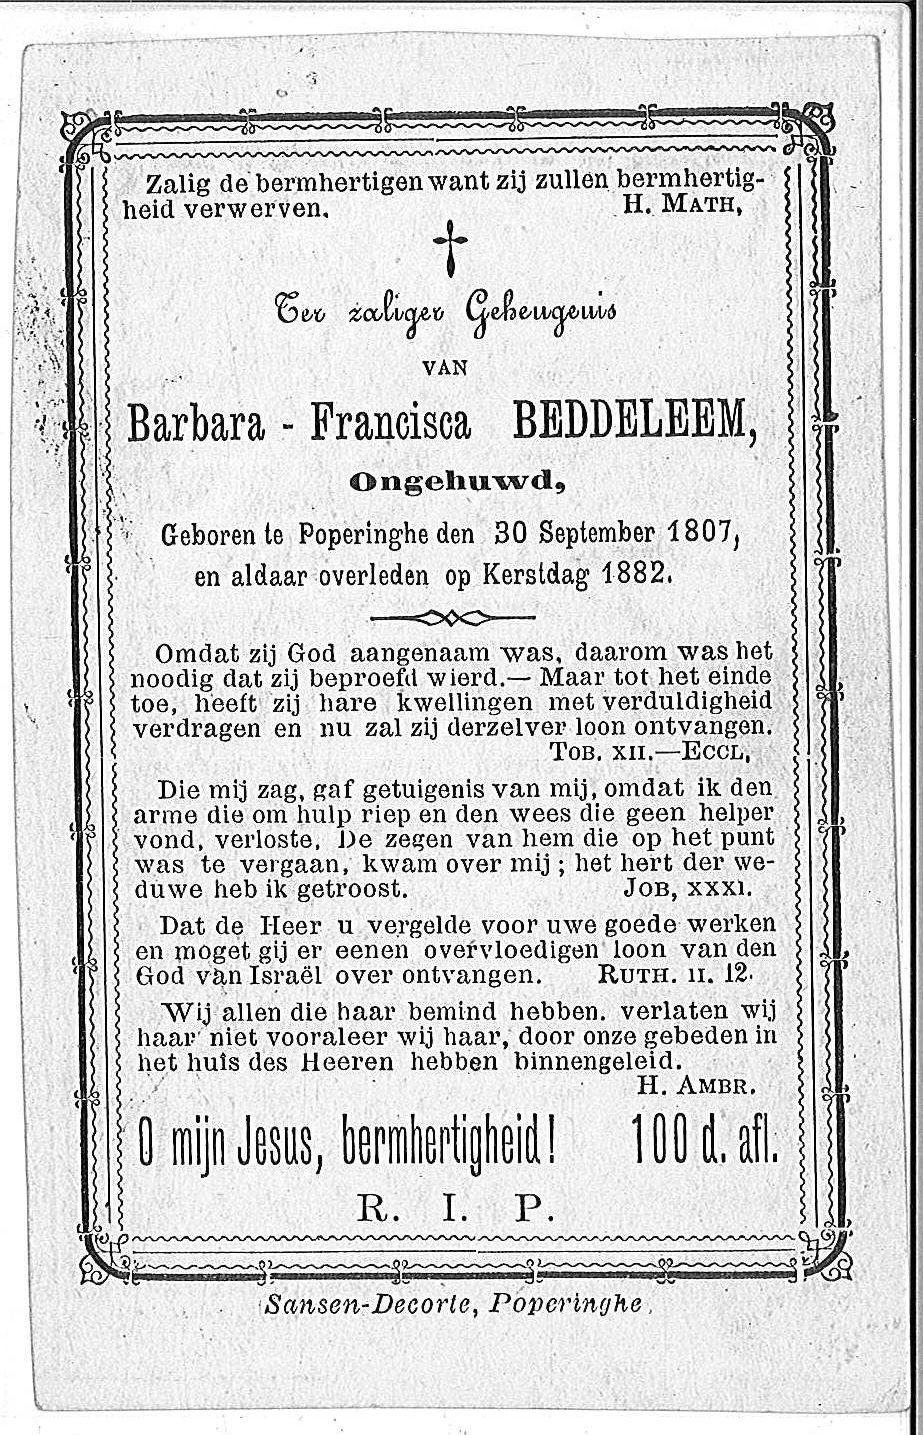 Barbara-Francisca Beddeleem